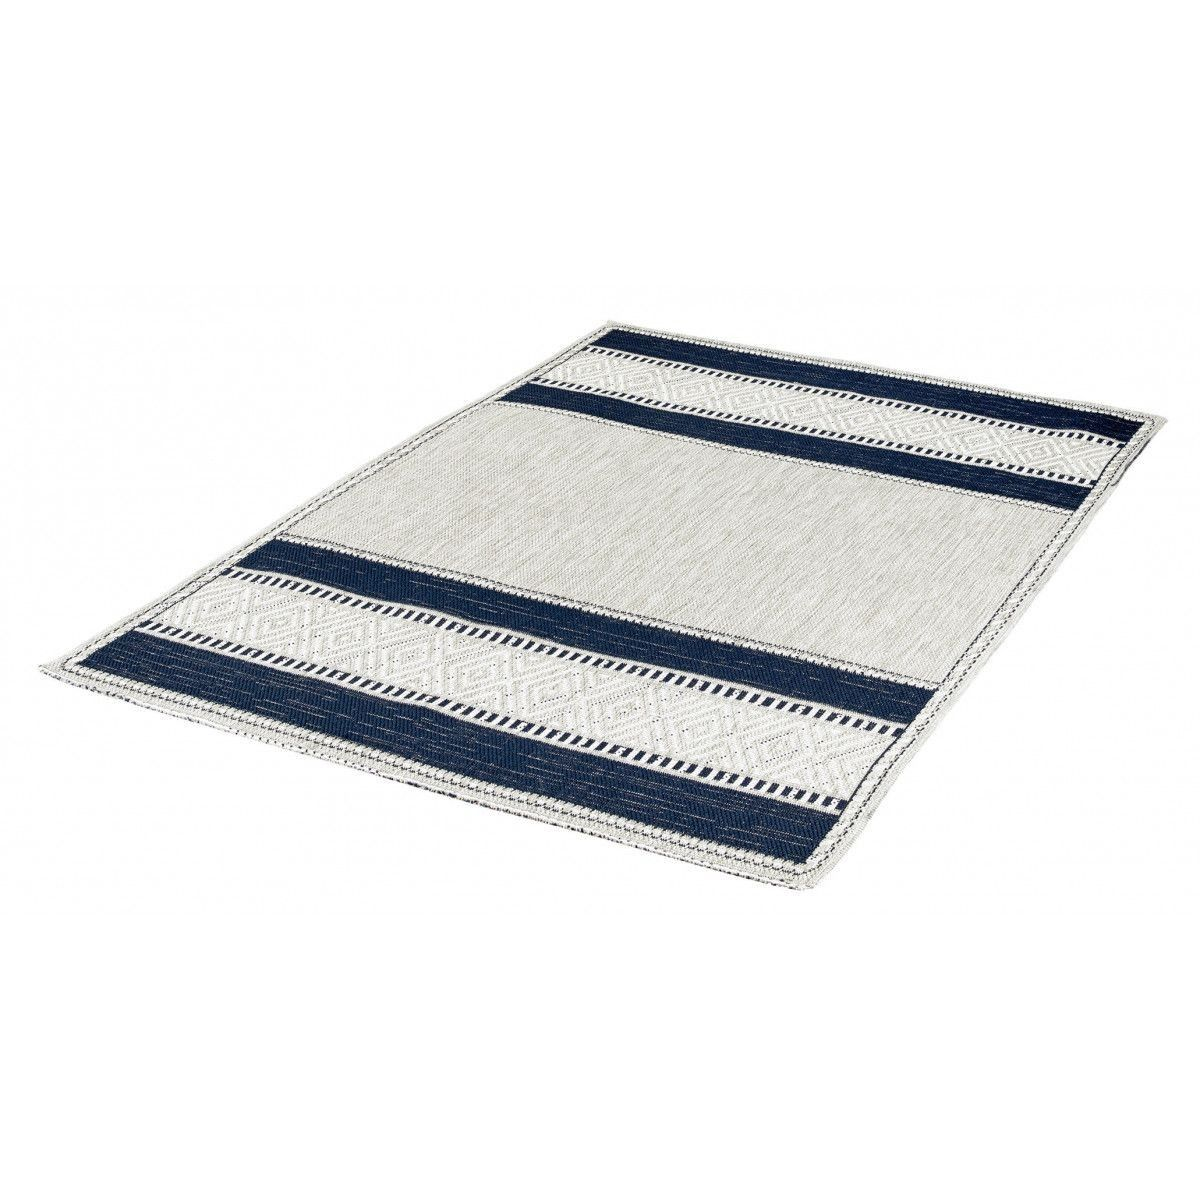 Tapis Reversible Bleu Marine Plat Moderne Euphorise Taille 080x150 Cm 120x170 Cm 160x230 Cm Tapis Tapis Salon